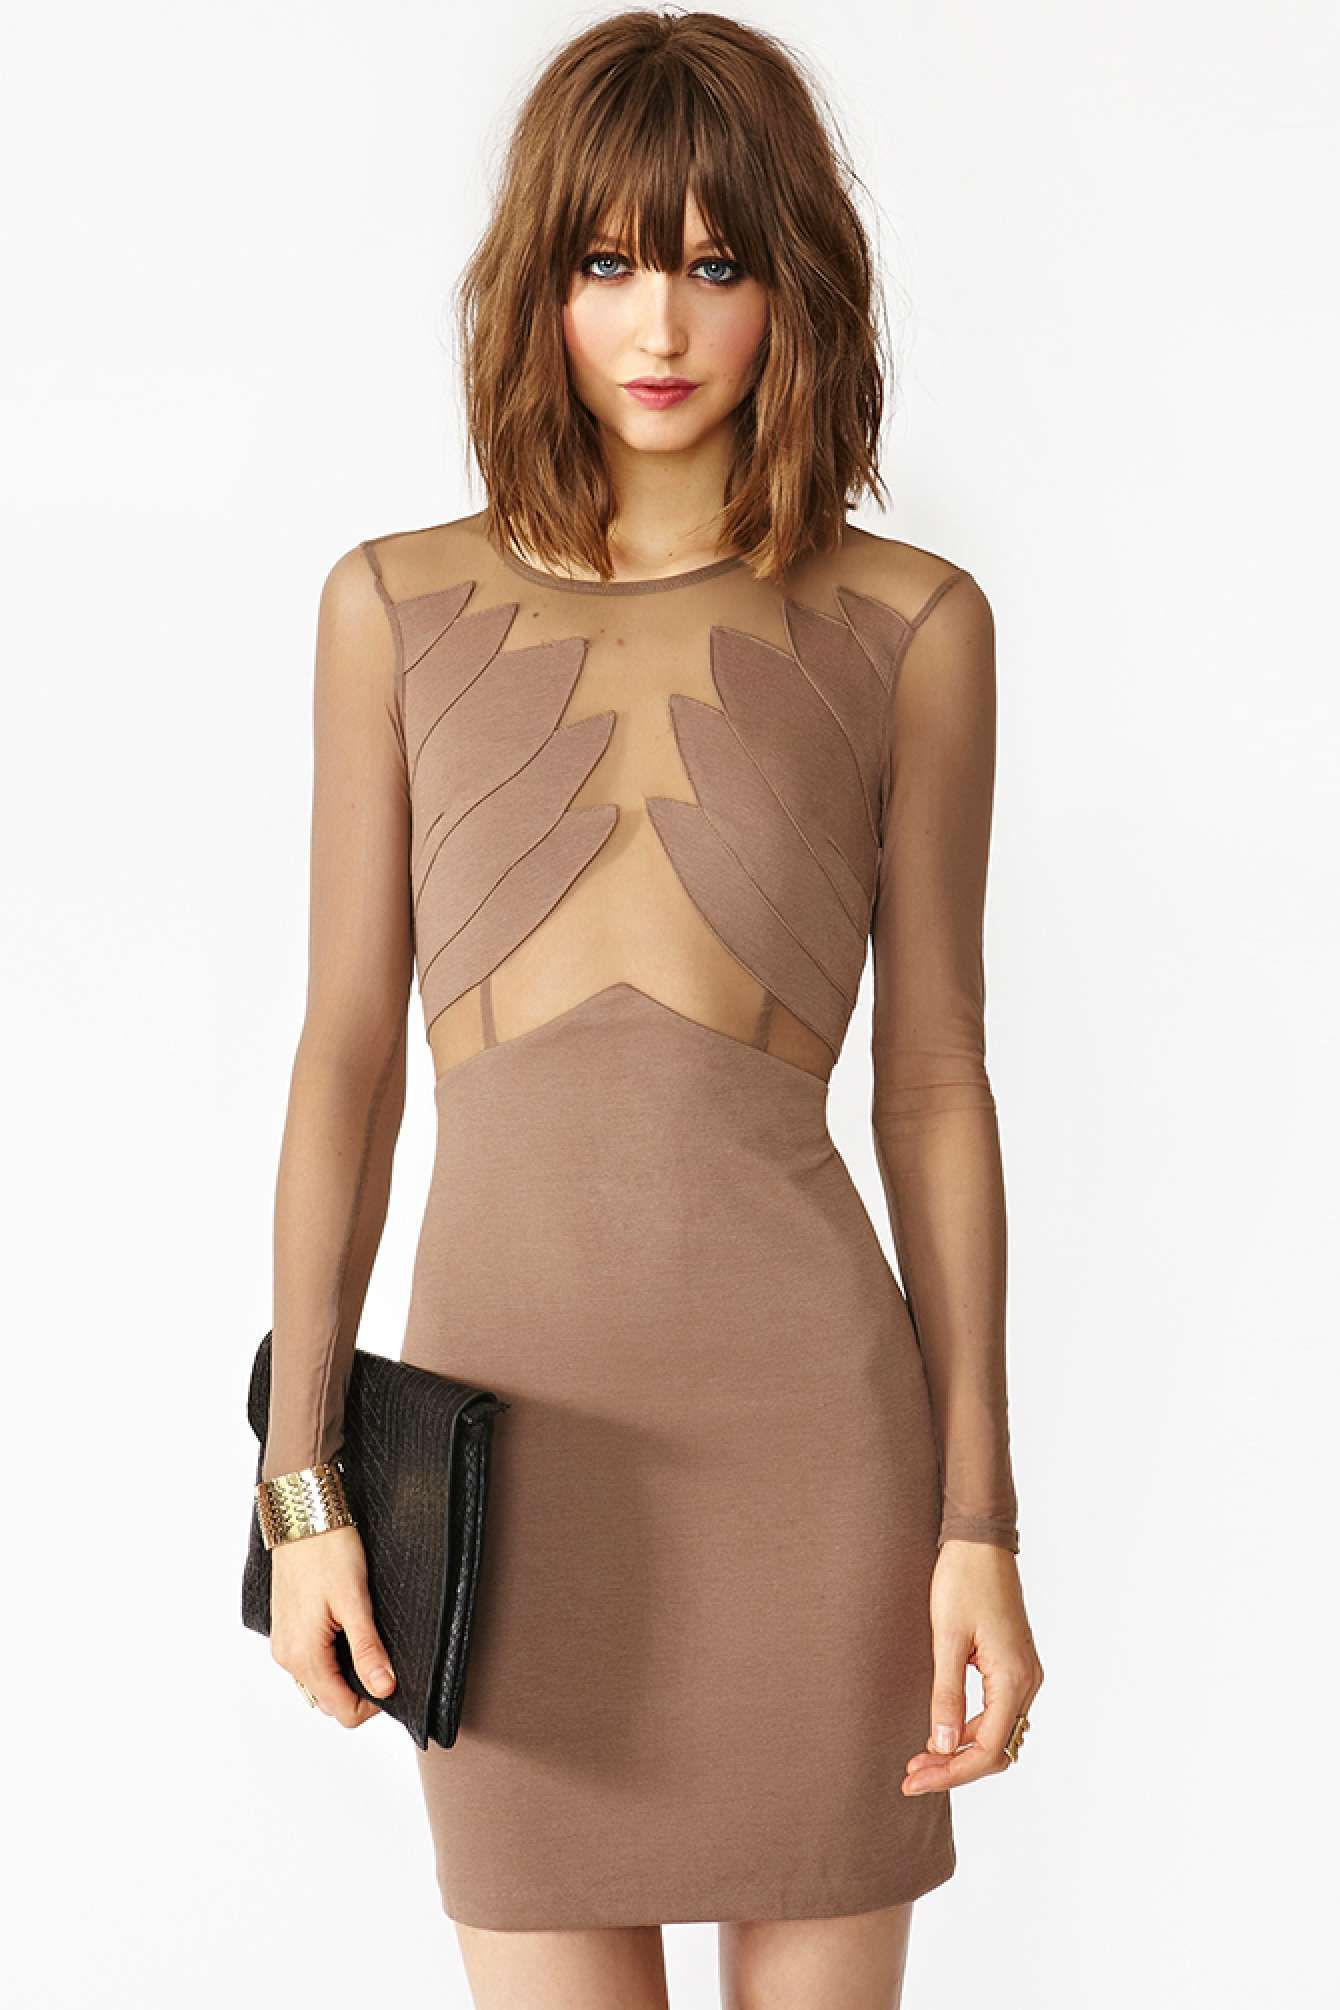 Women's Online Clothes & Fashion Shopping